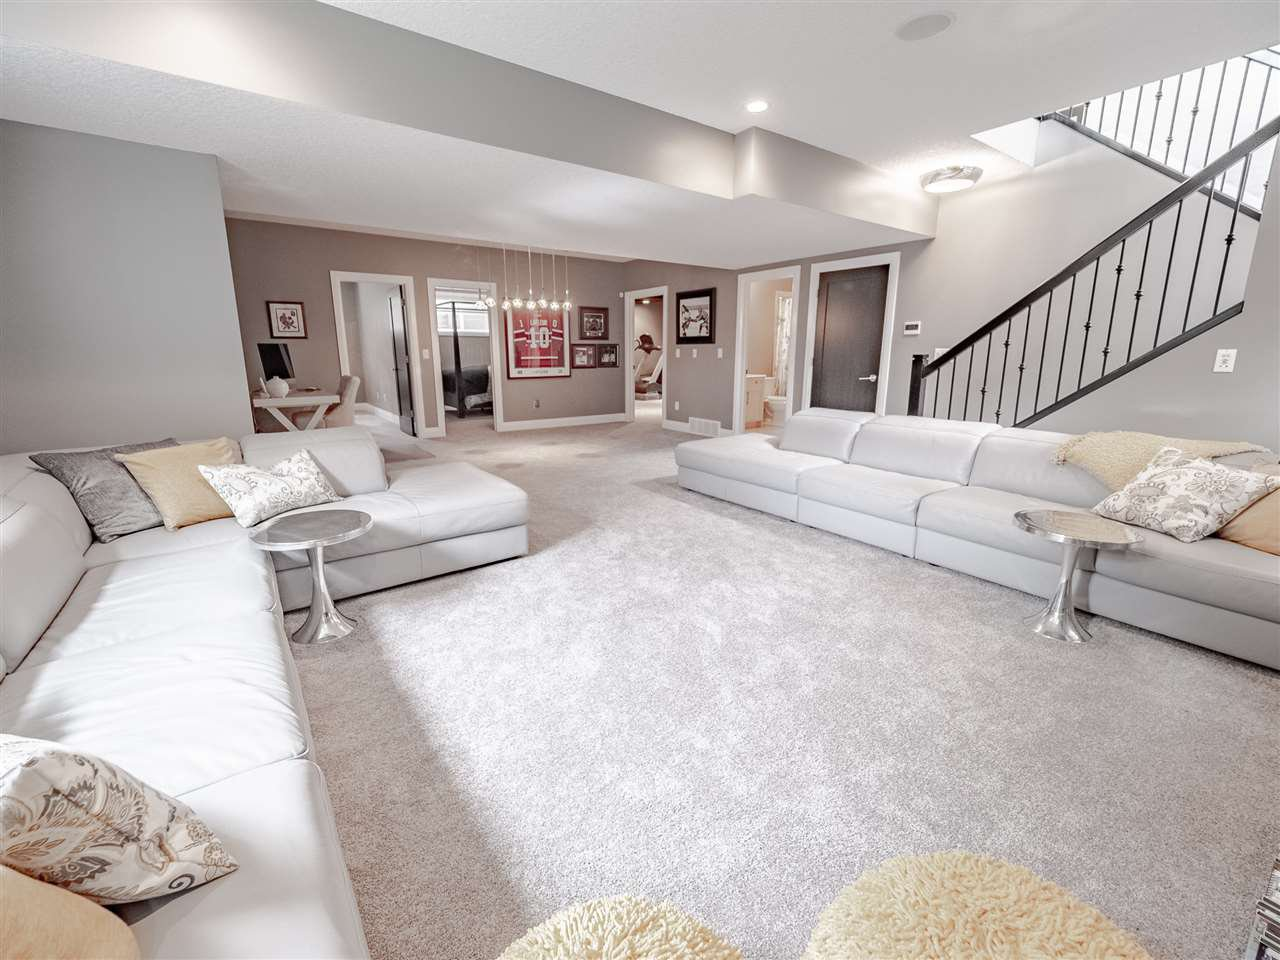 Photo 29: Photos: 58 Kenton Woods Lane NW: Spruce Grove House for sale : MLS®# E4166439